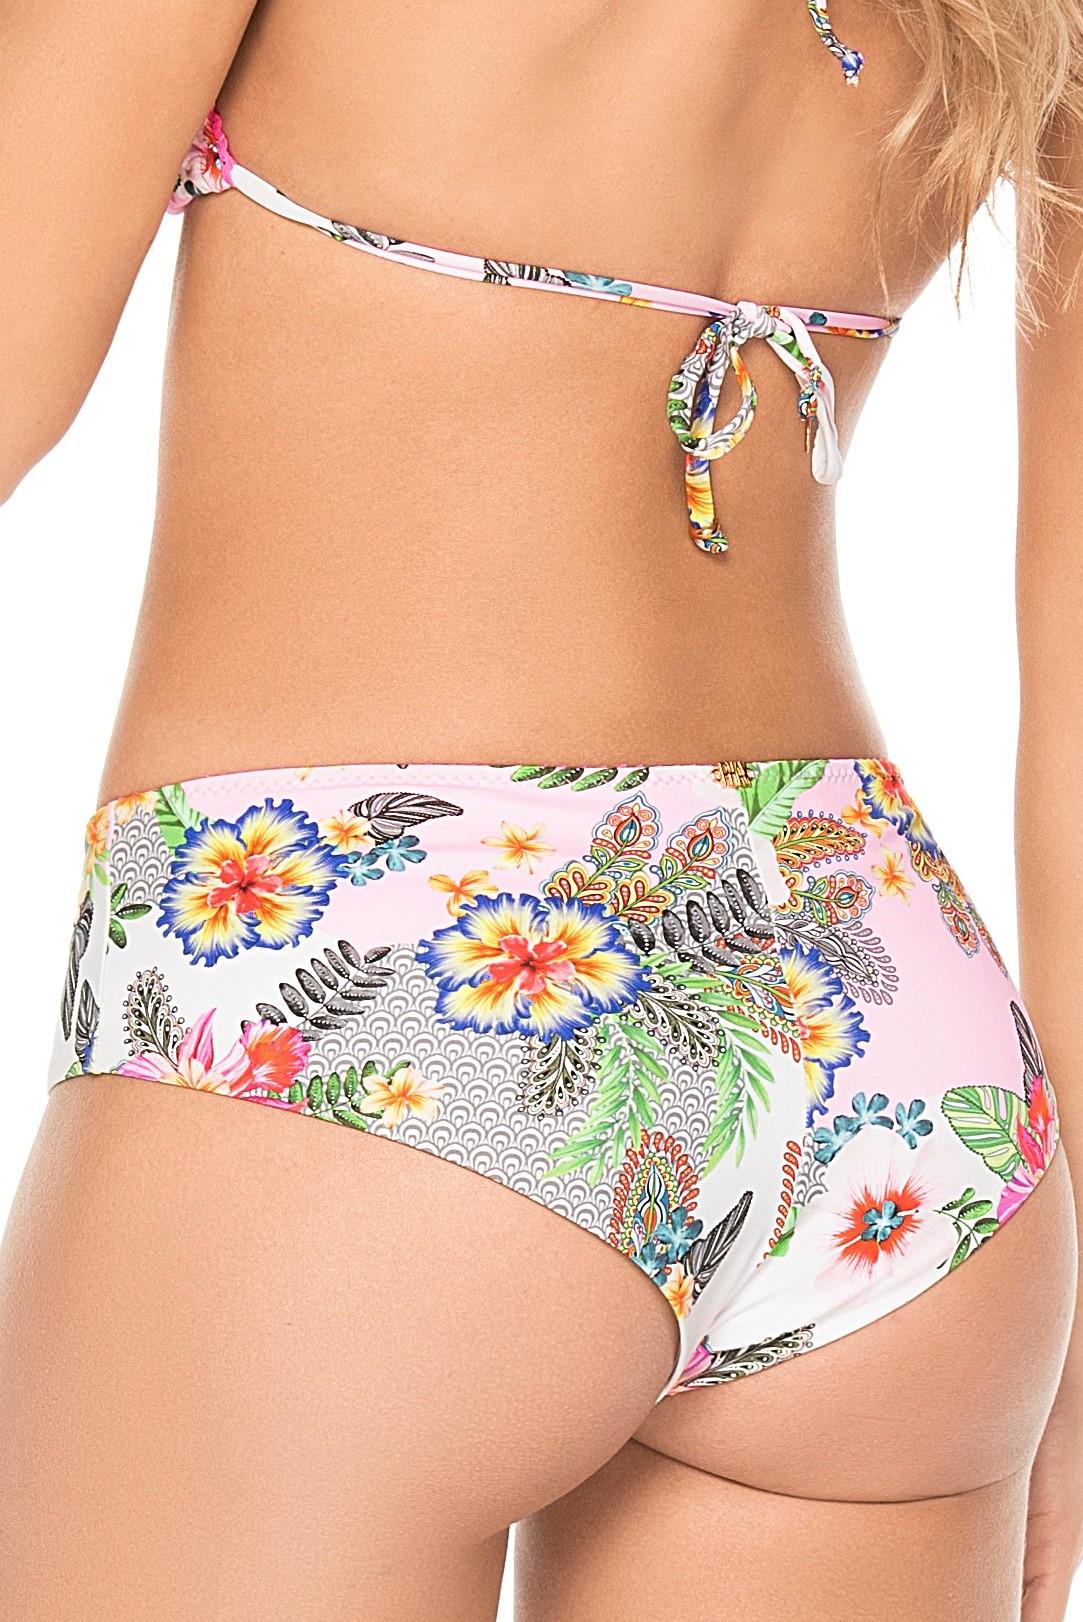 Phax Seagrass Bay Triangle Bikini -medium-Multicolour